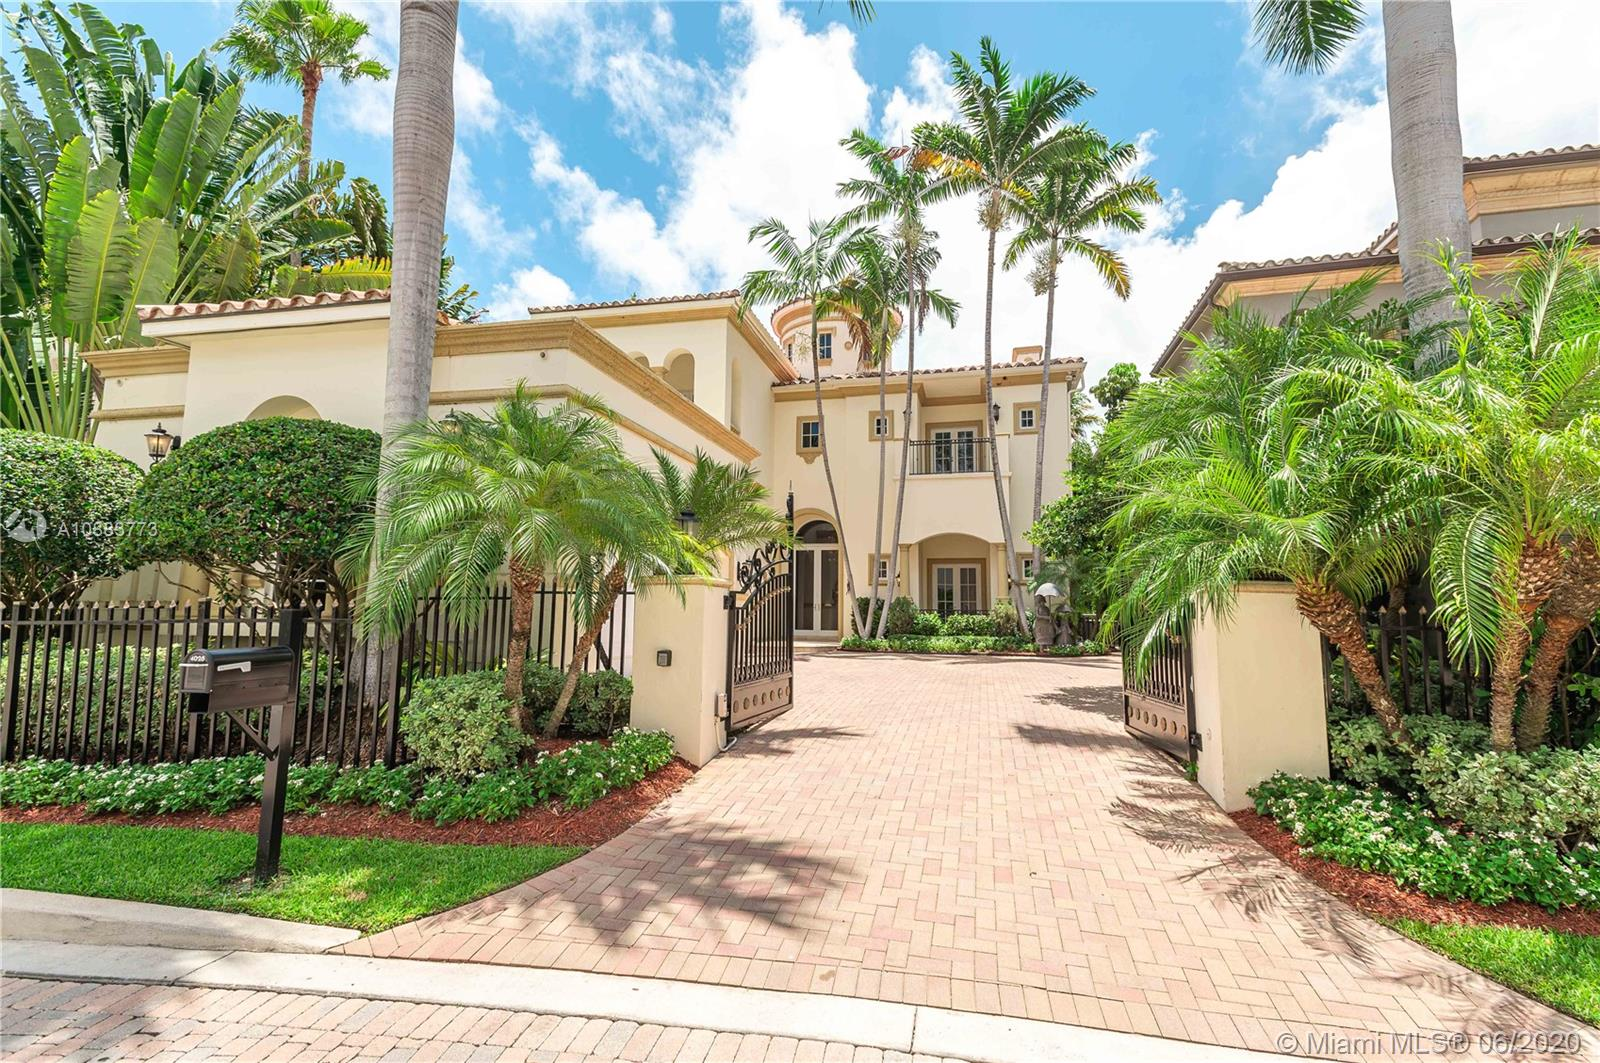 4028 Island Estates Dr Property Photo - Aventura, FL real estate listing